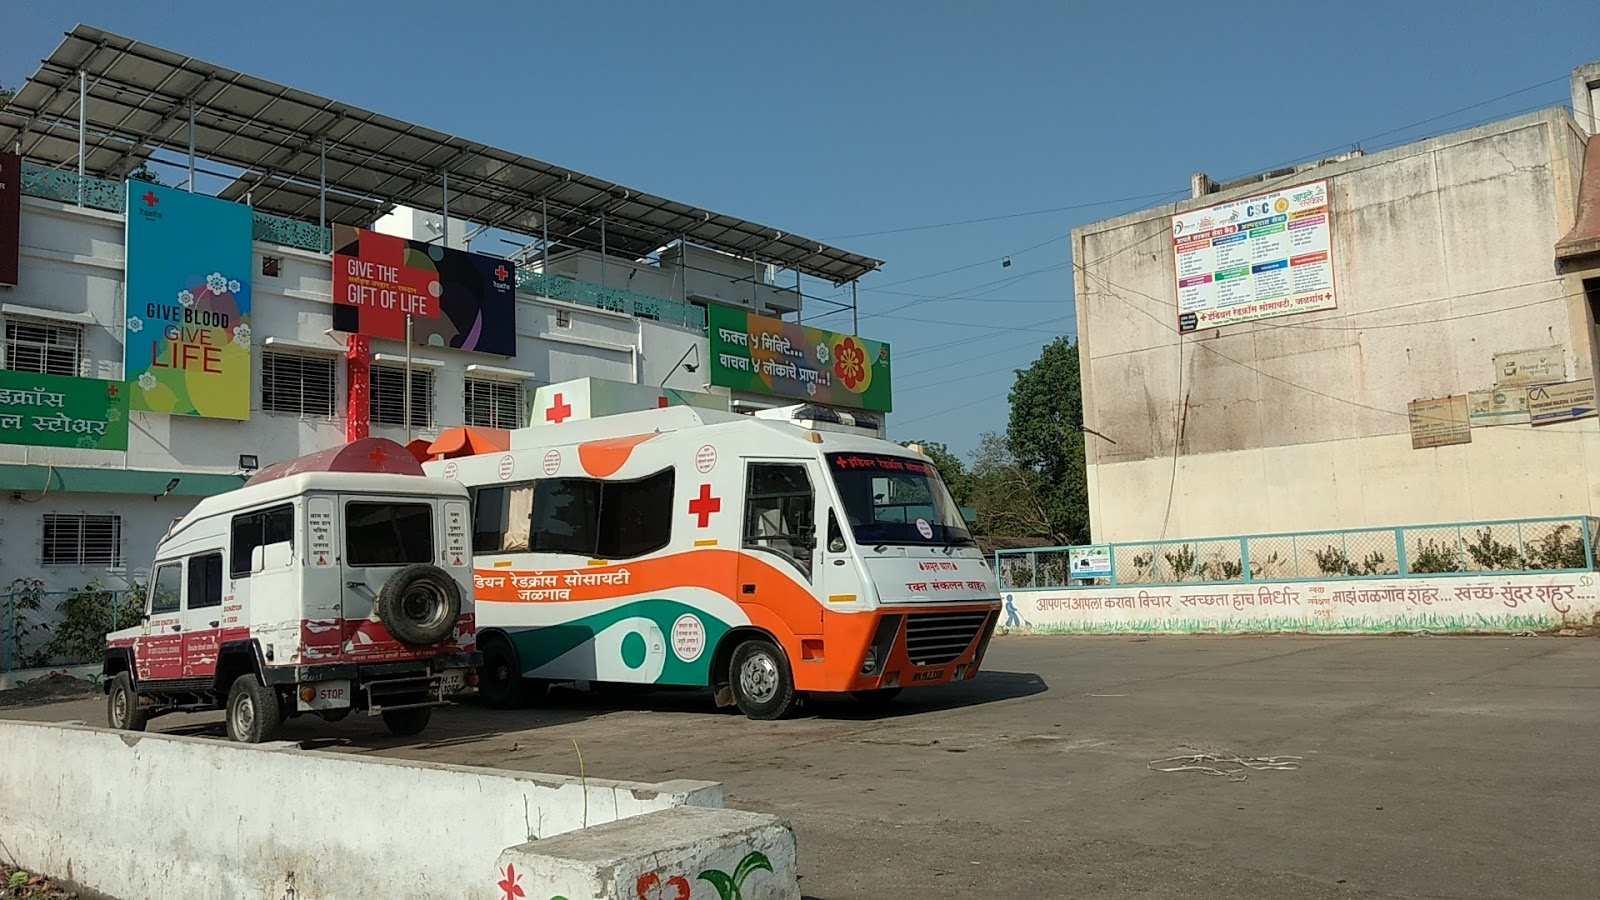 blood bank Indian Red Cross Society near Jalgaon